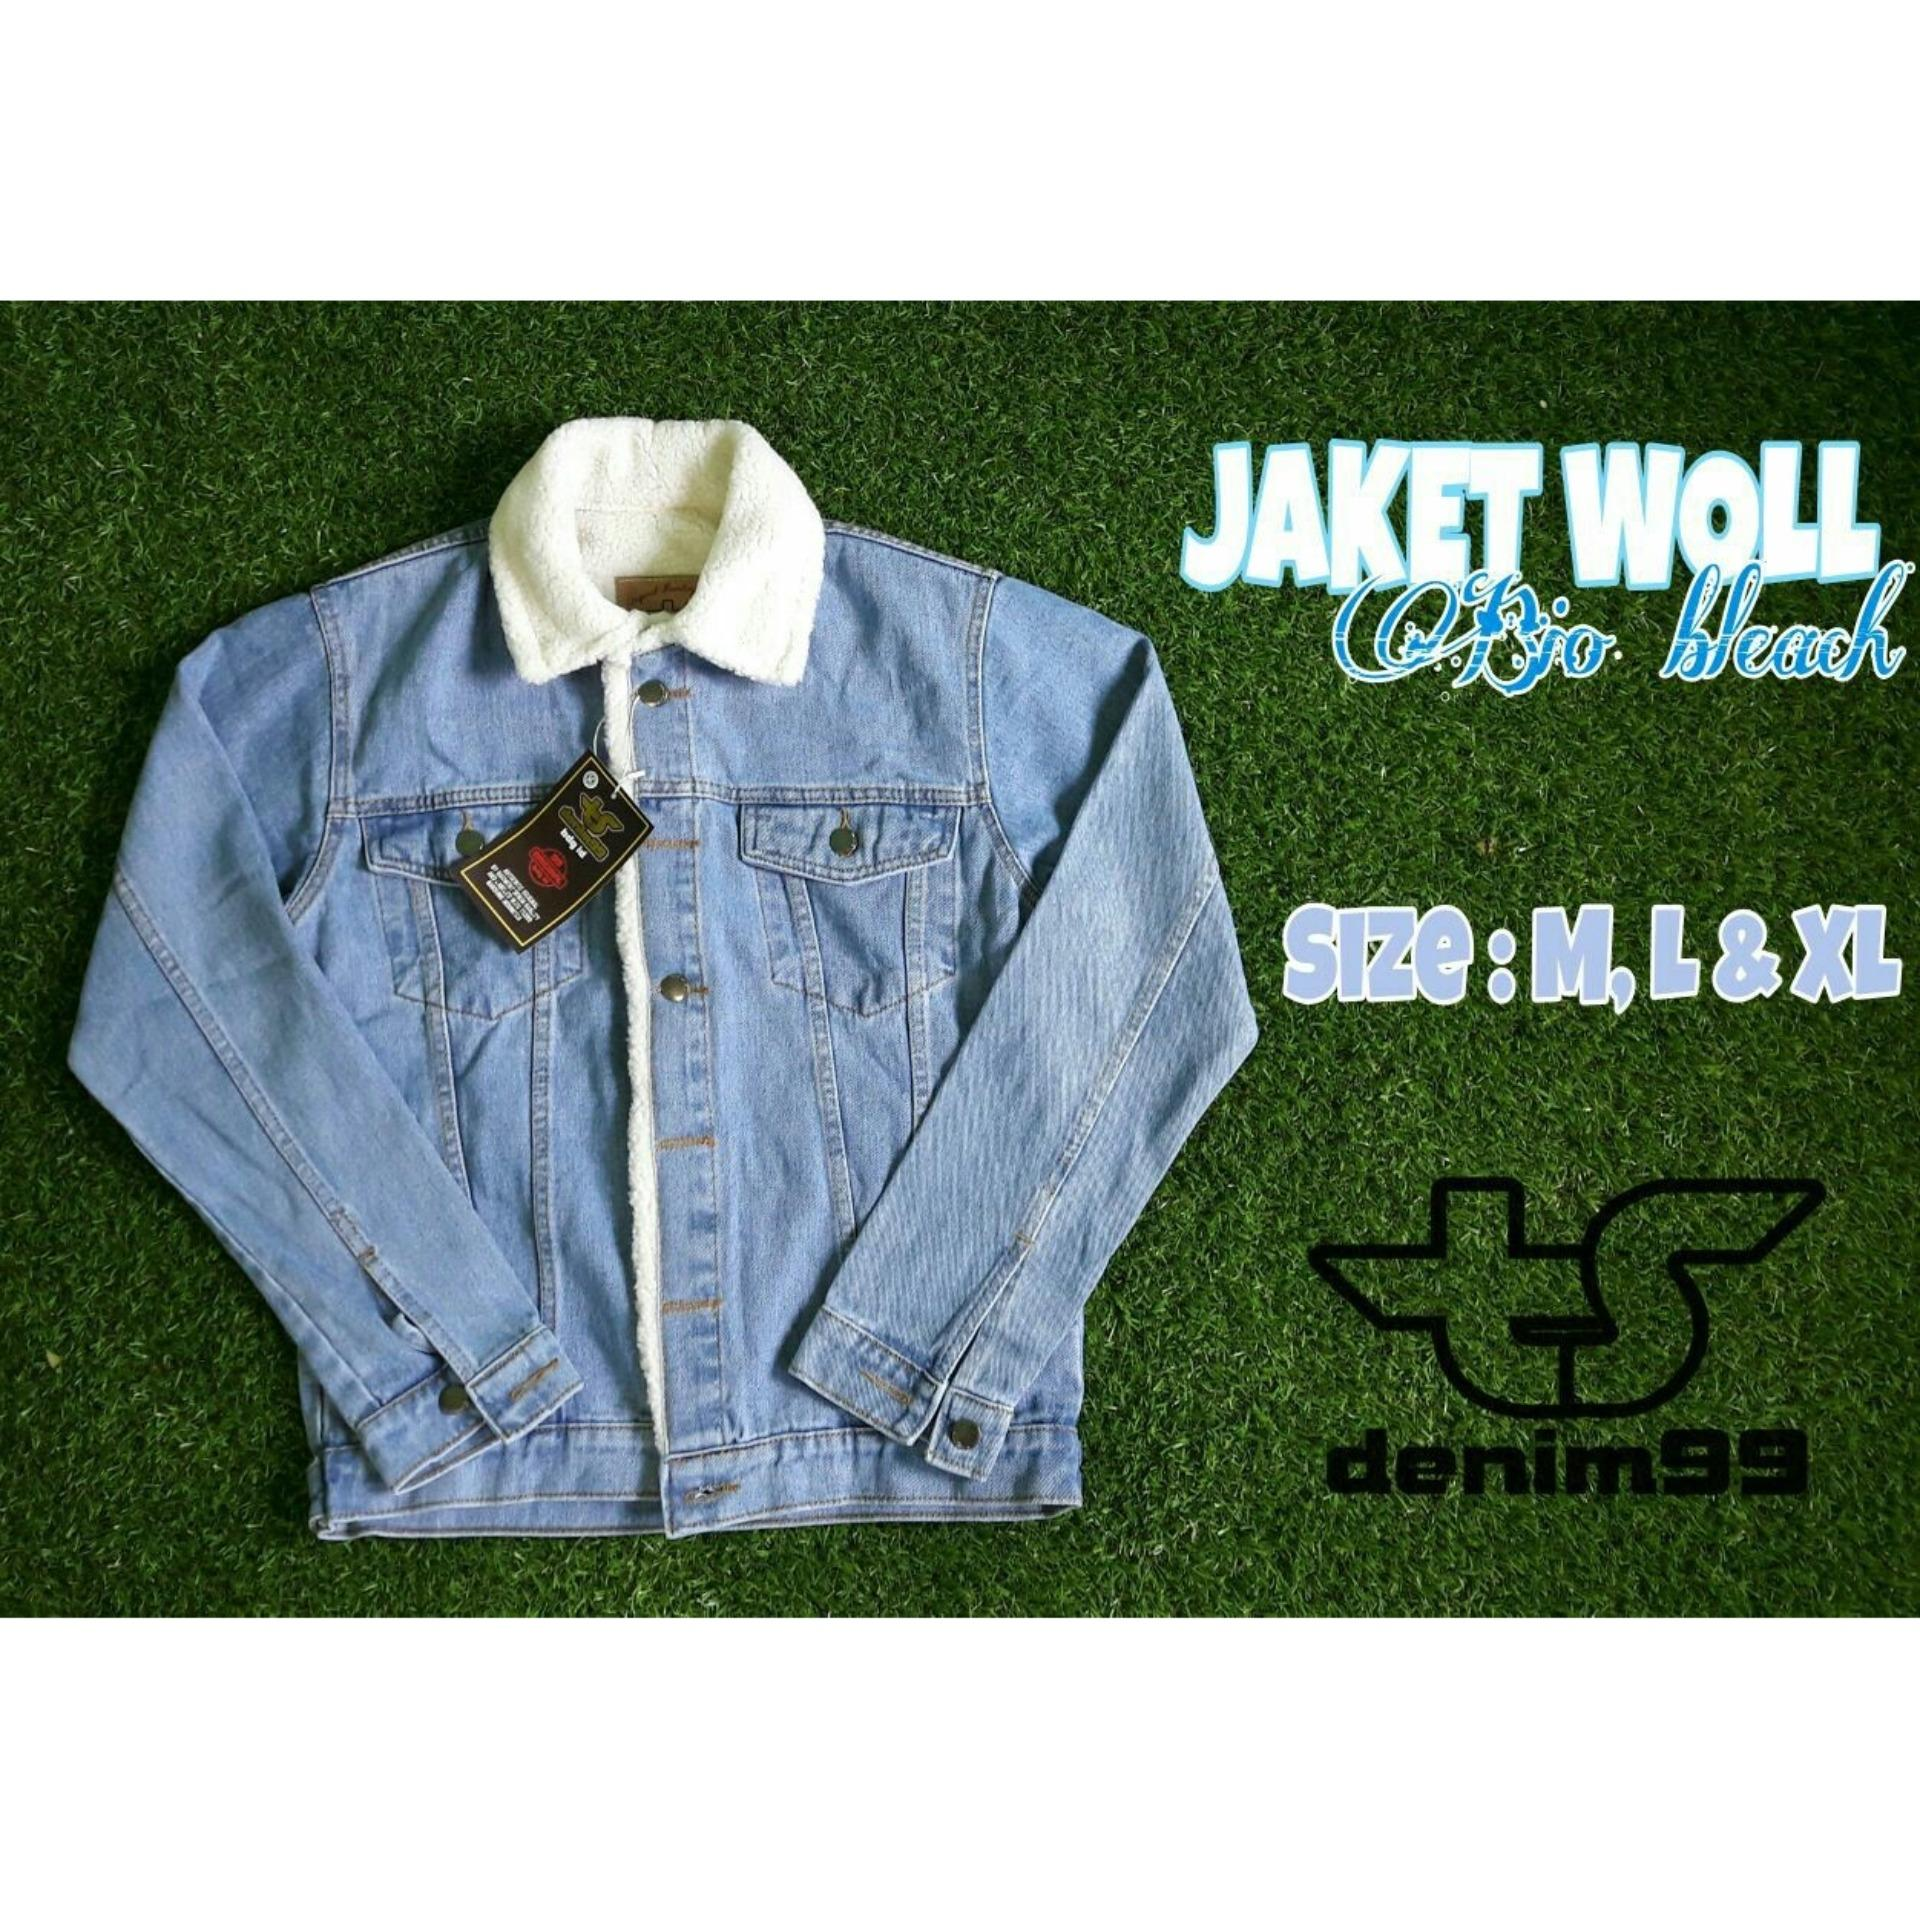 HARGA PROMO Jaket jeans bulu bioblitz pria – Jualan Online Teraman ... 5120cda3a6